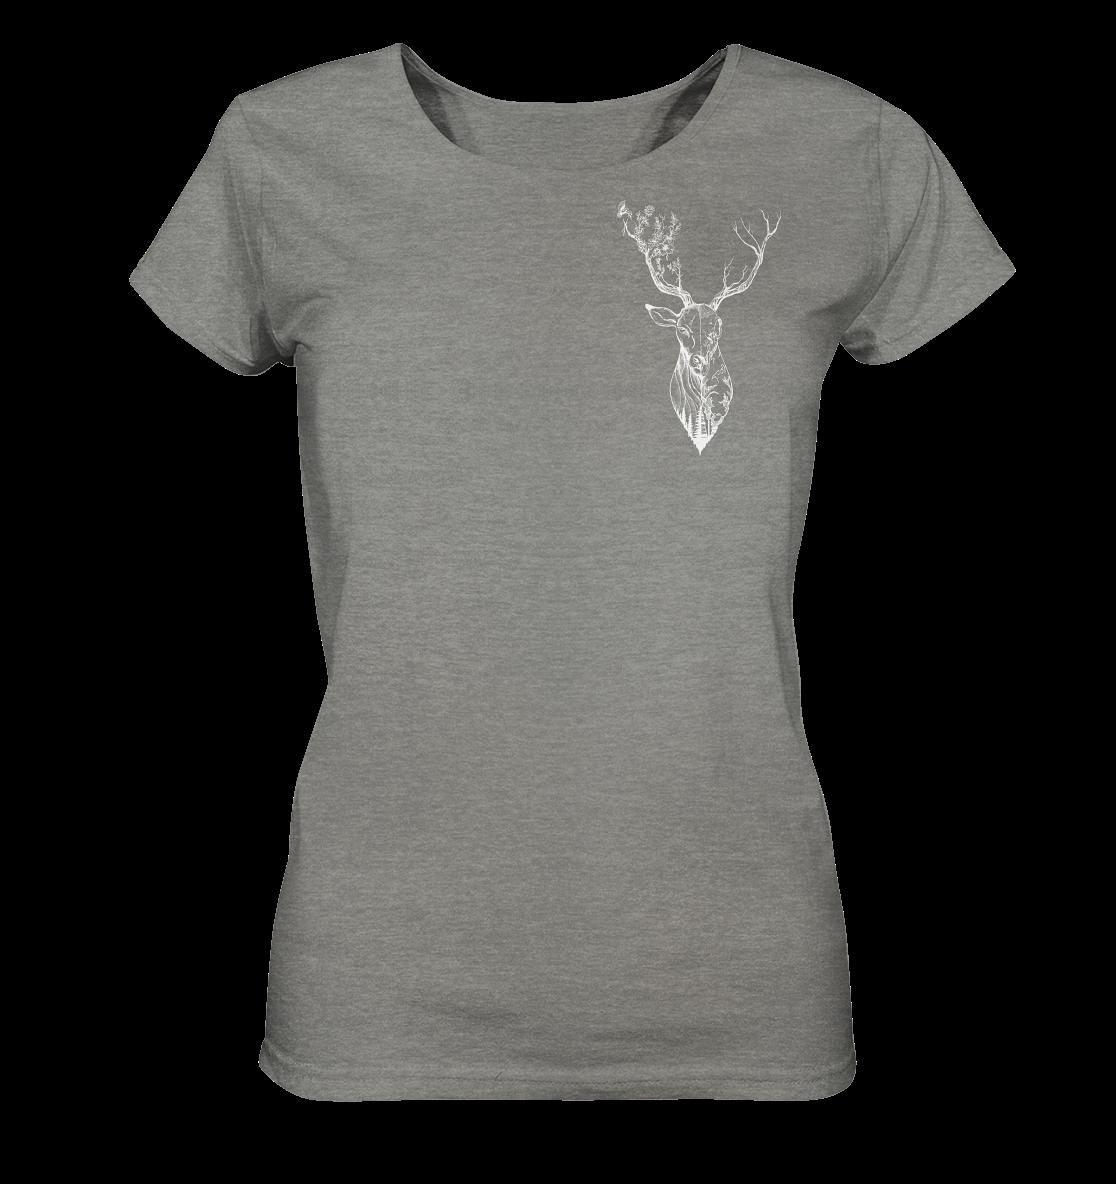 front-ladies-organic-shirt-meliert-818381-1116x-7.png